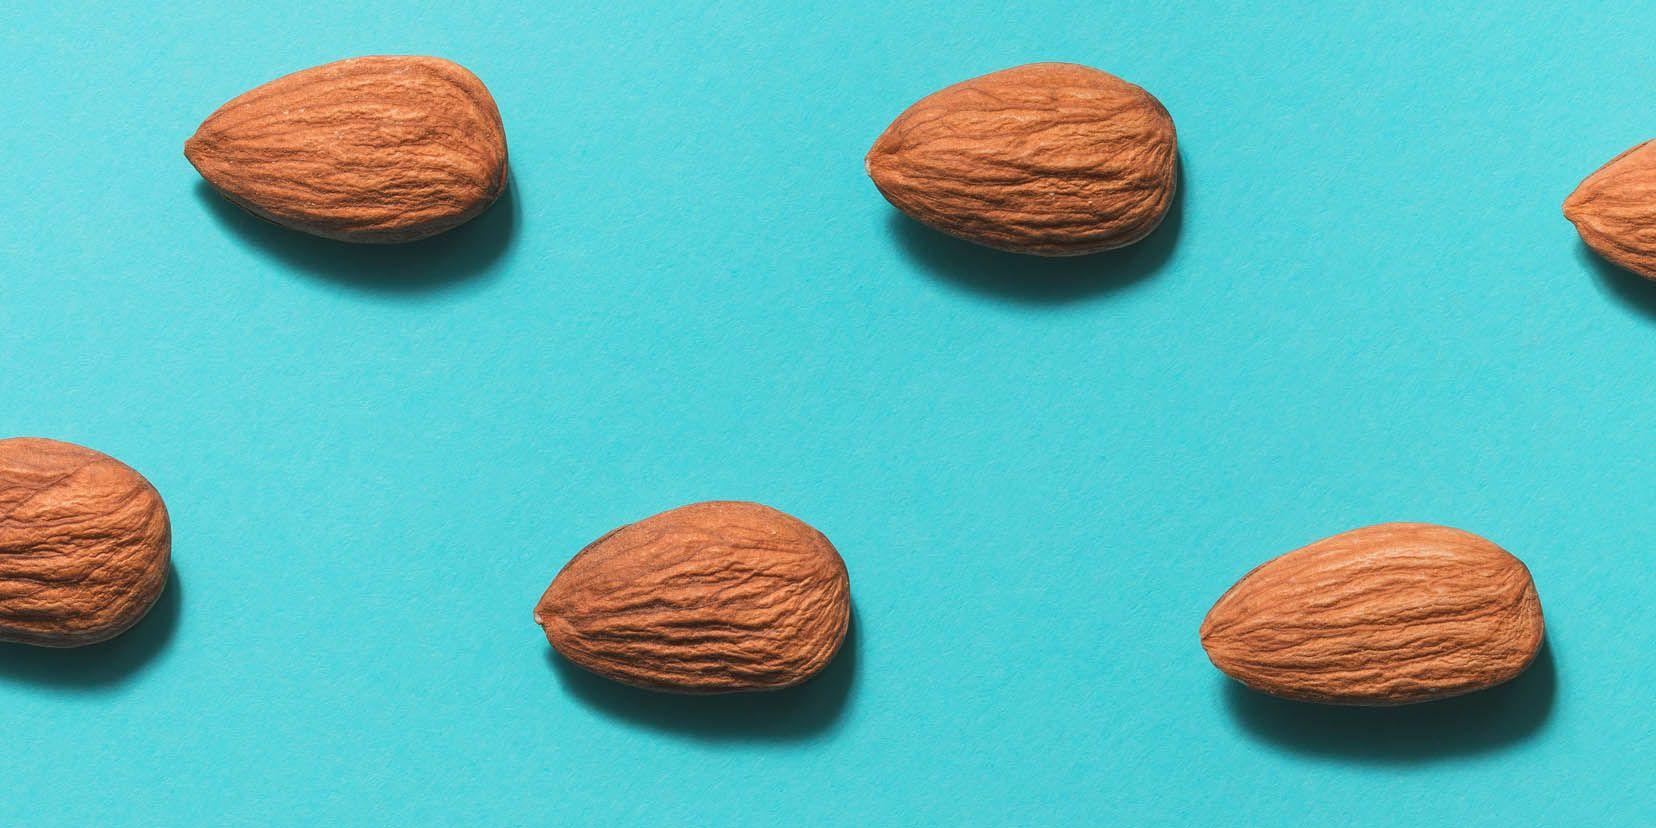 Symmetrical pattern of almonds on blue. Flat lay.